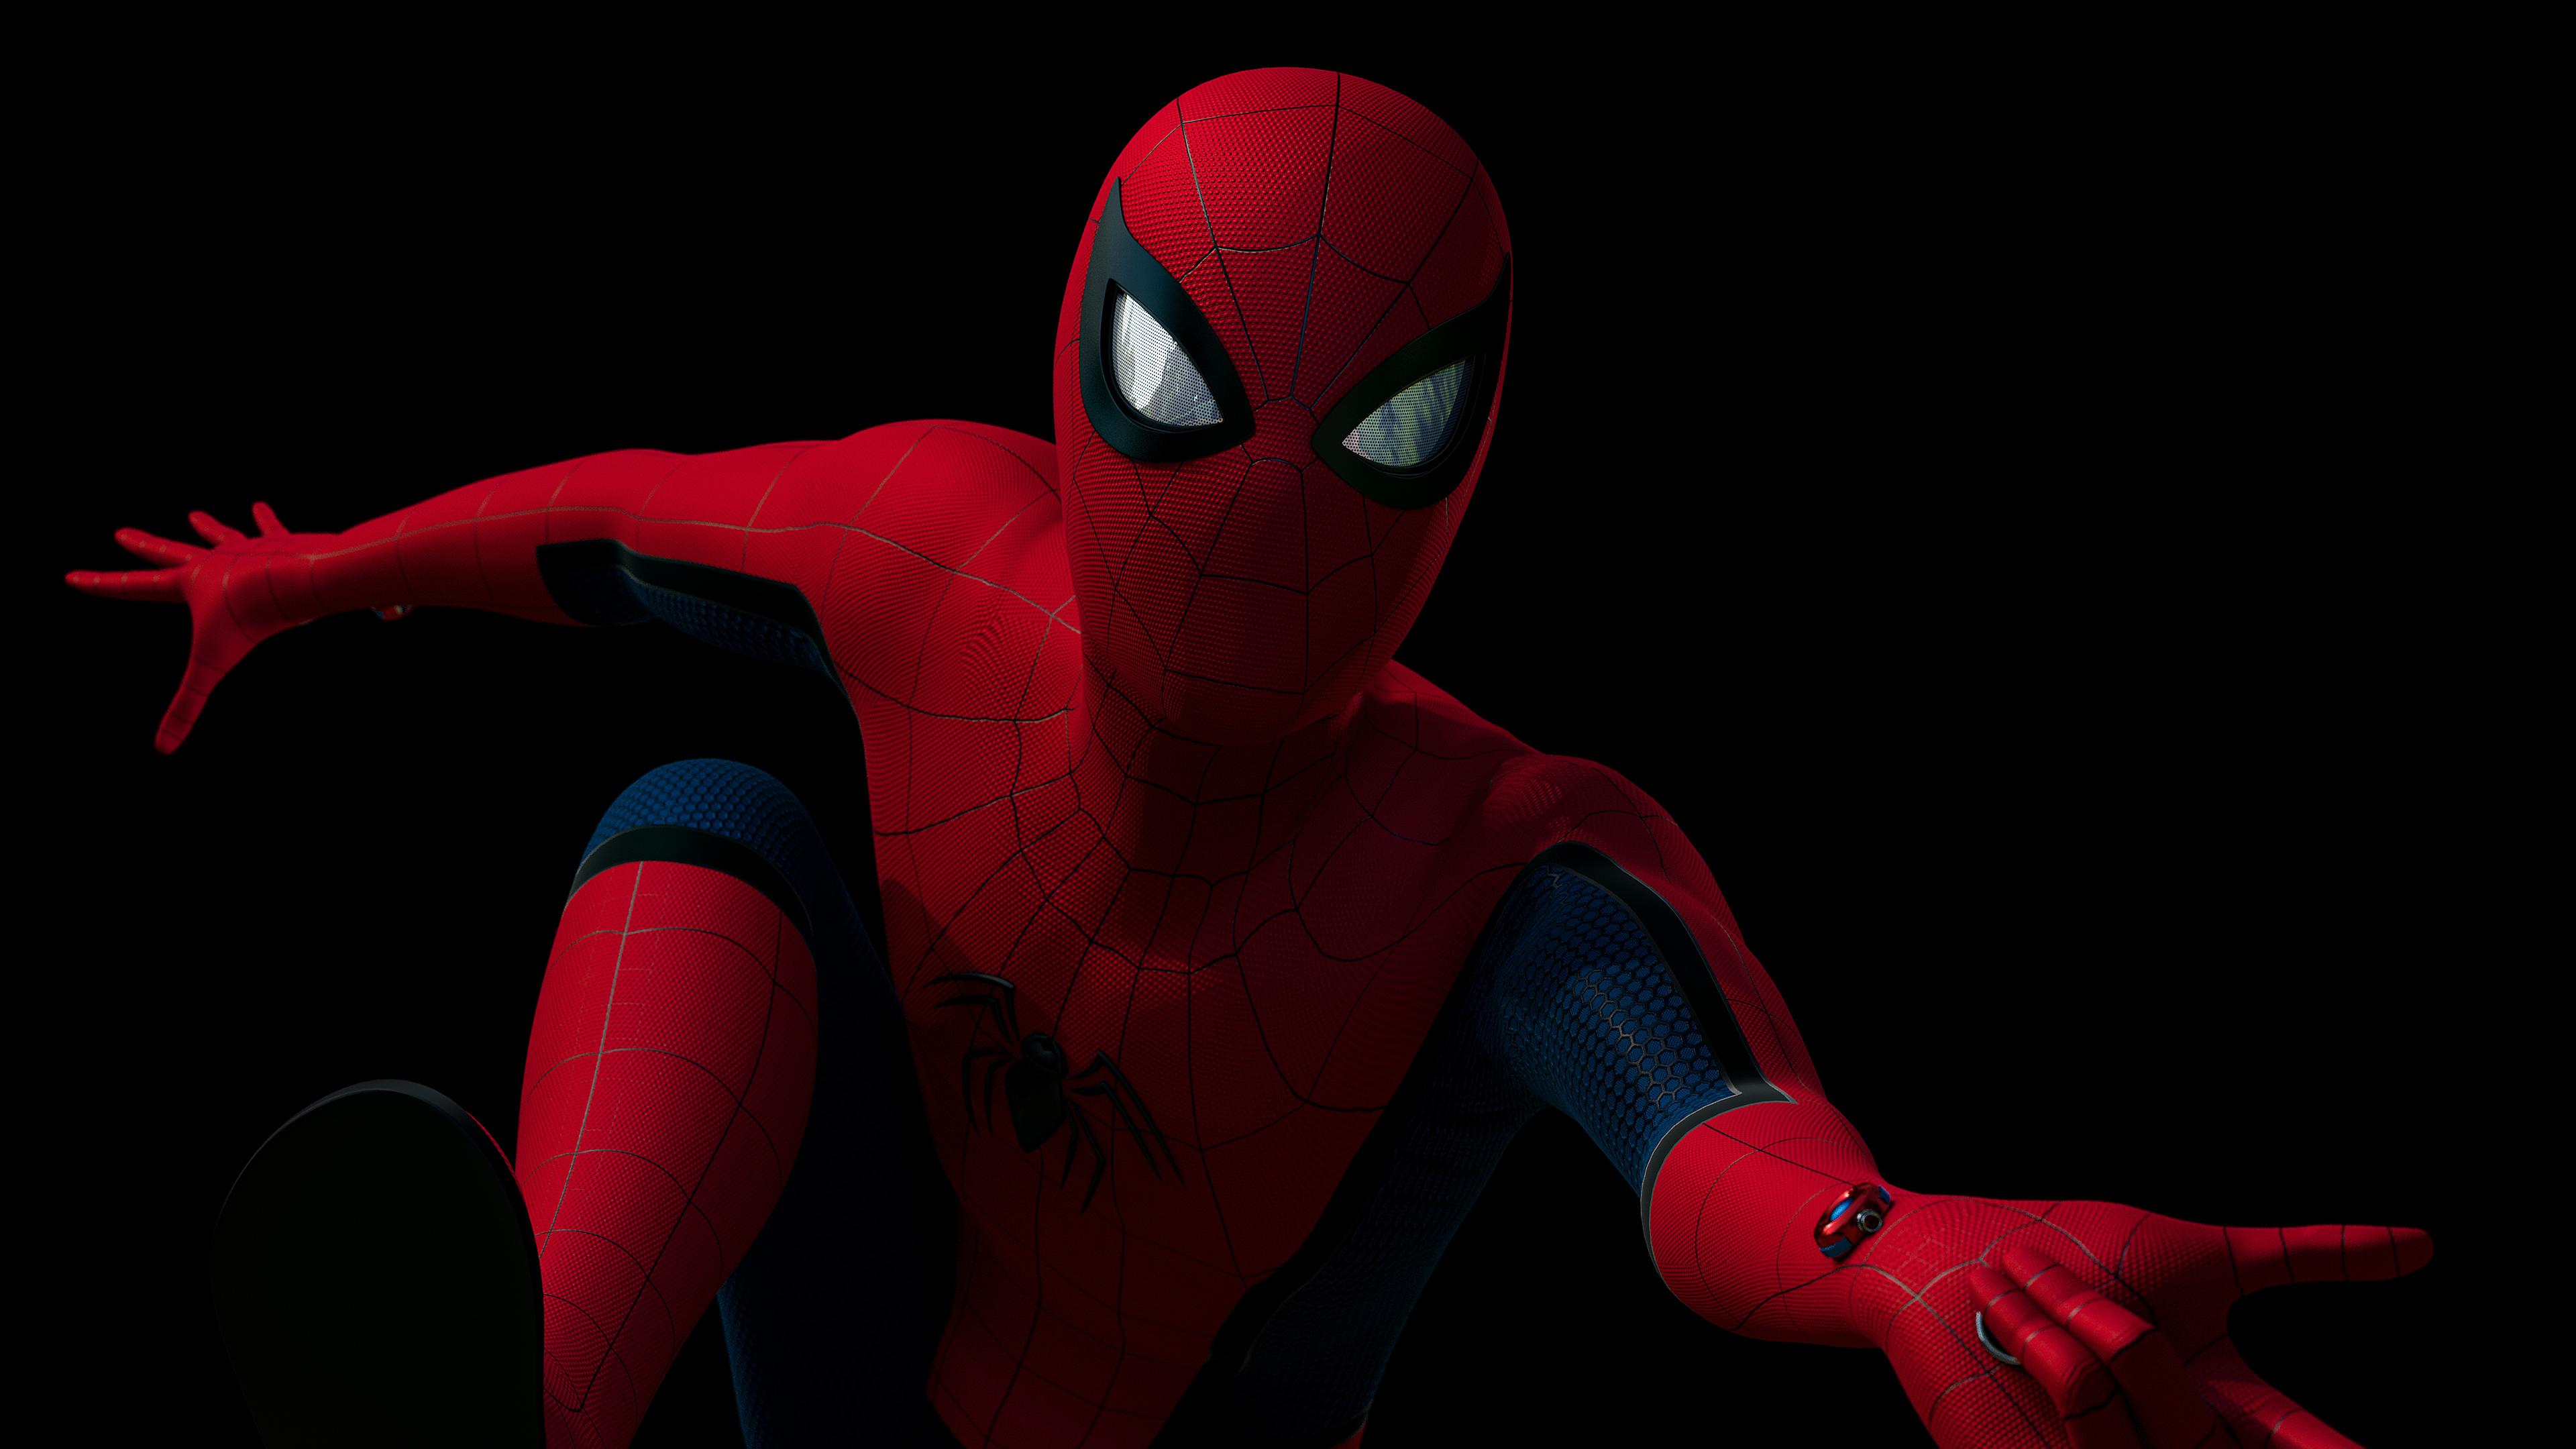 cgi spider man 1560533712 - CGI Spider Man - superheroes wallpapers, spiderman wallpapers, hd-wallpapers, digital art wallpapers, deviantart wallpapers, artwork wallpapers, artist wallpapers, 4k-wallpapers